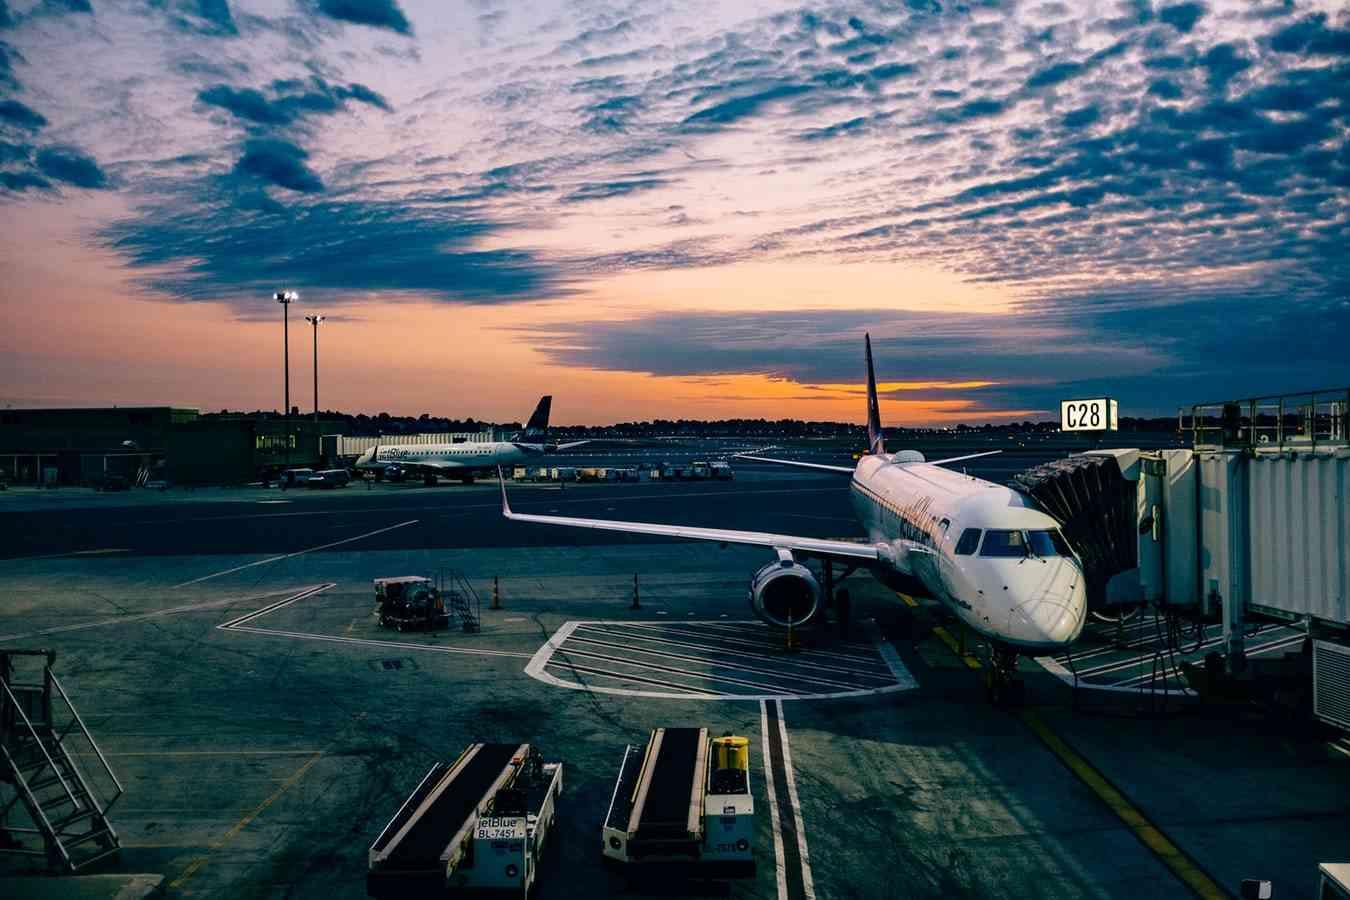 Letadlo sydney melbourne